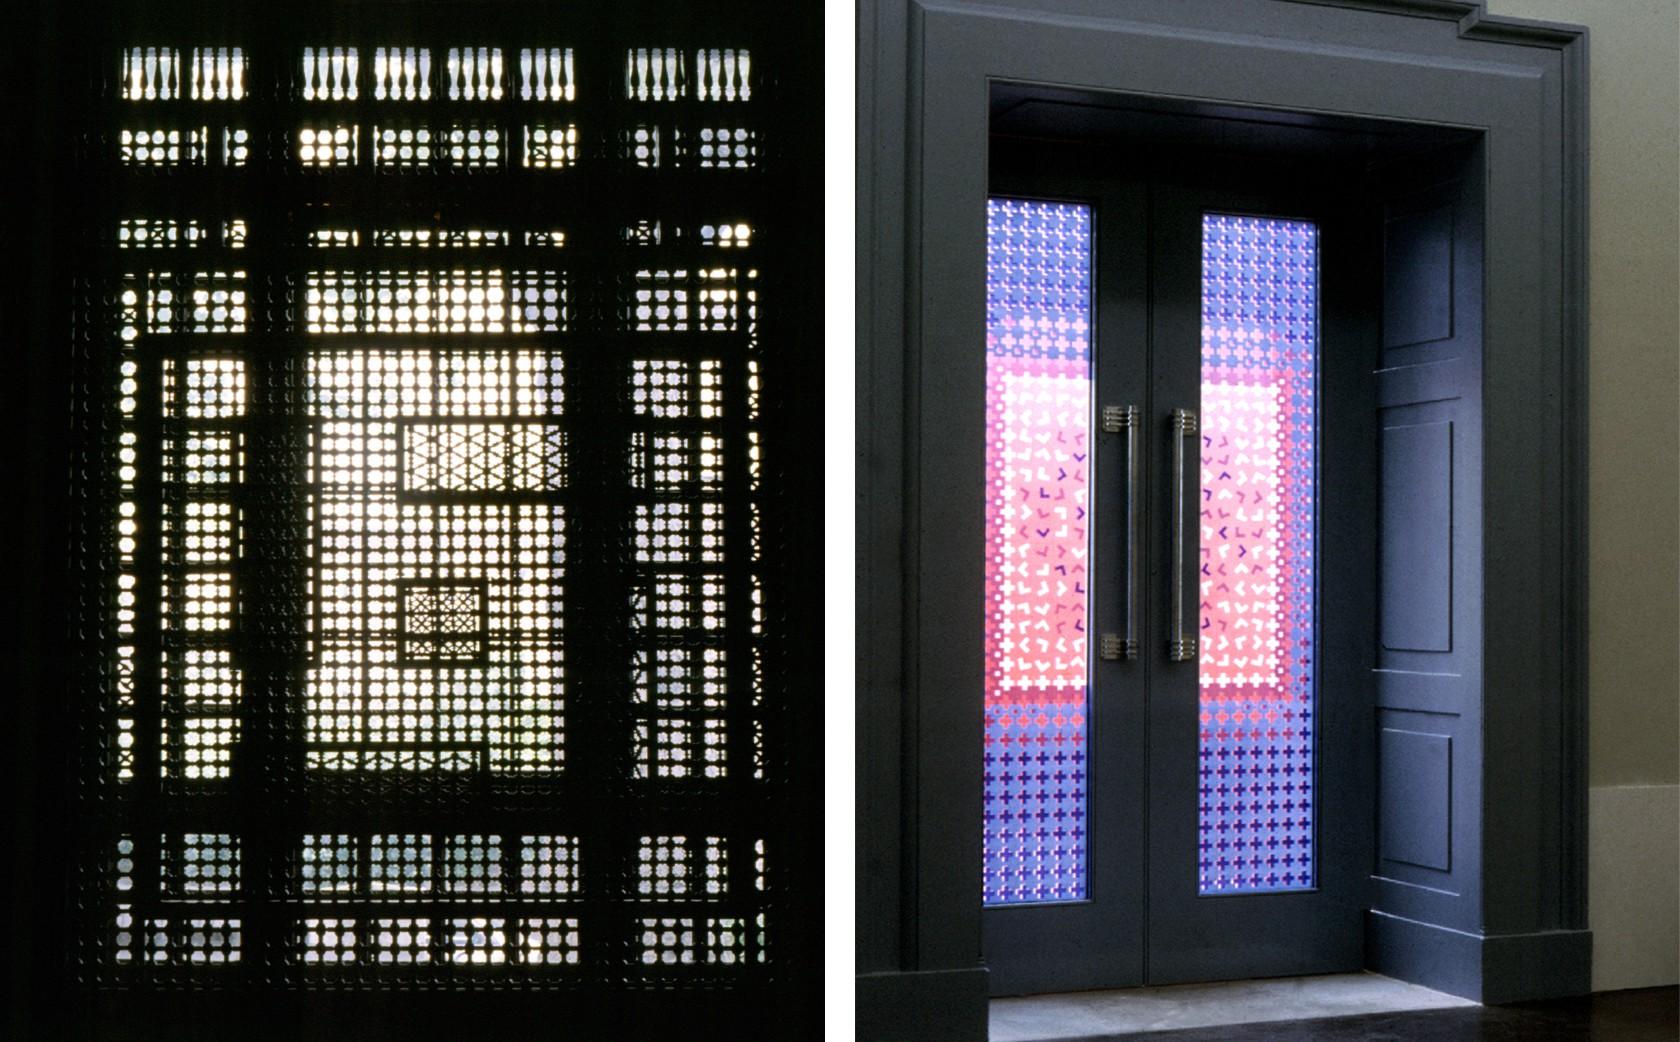 the Damascene Musharabiyeh Islamic Screens and Contemporary Glass Screens